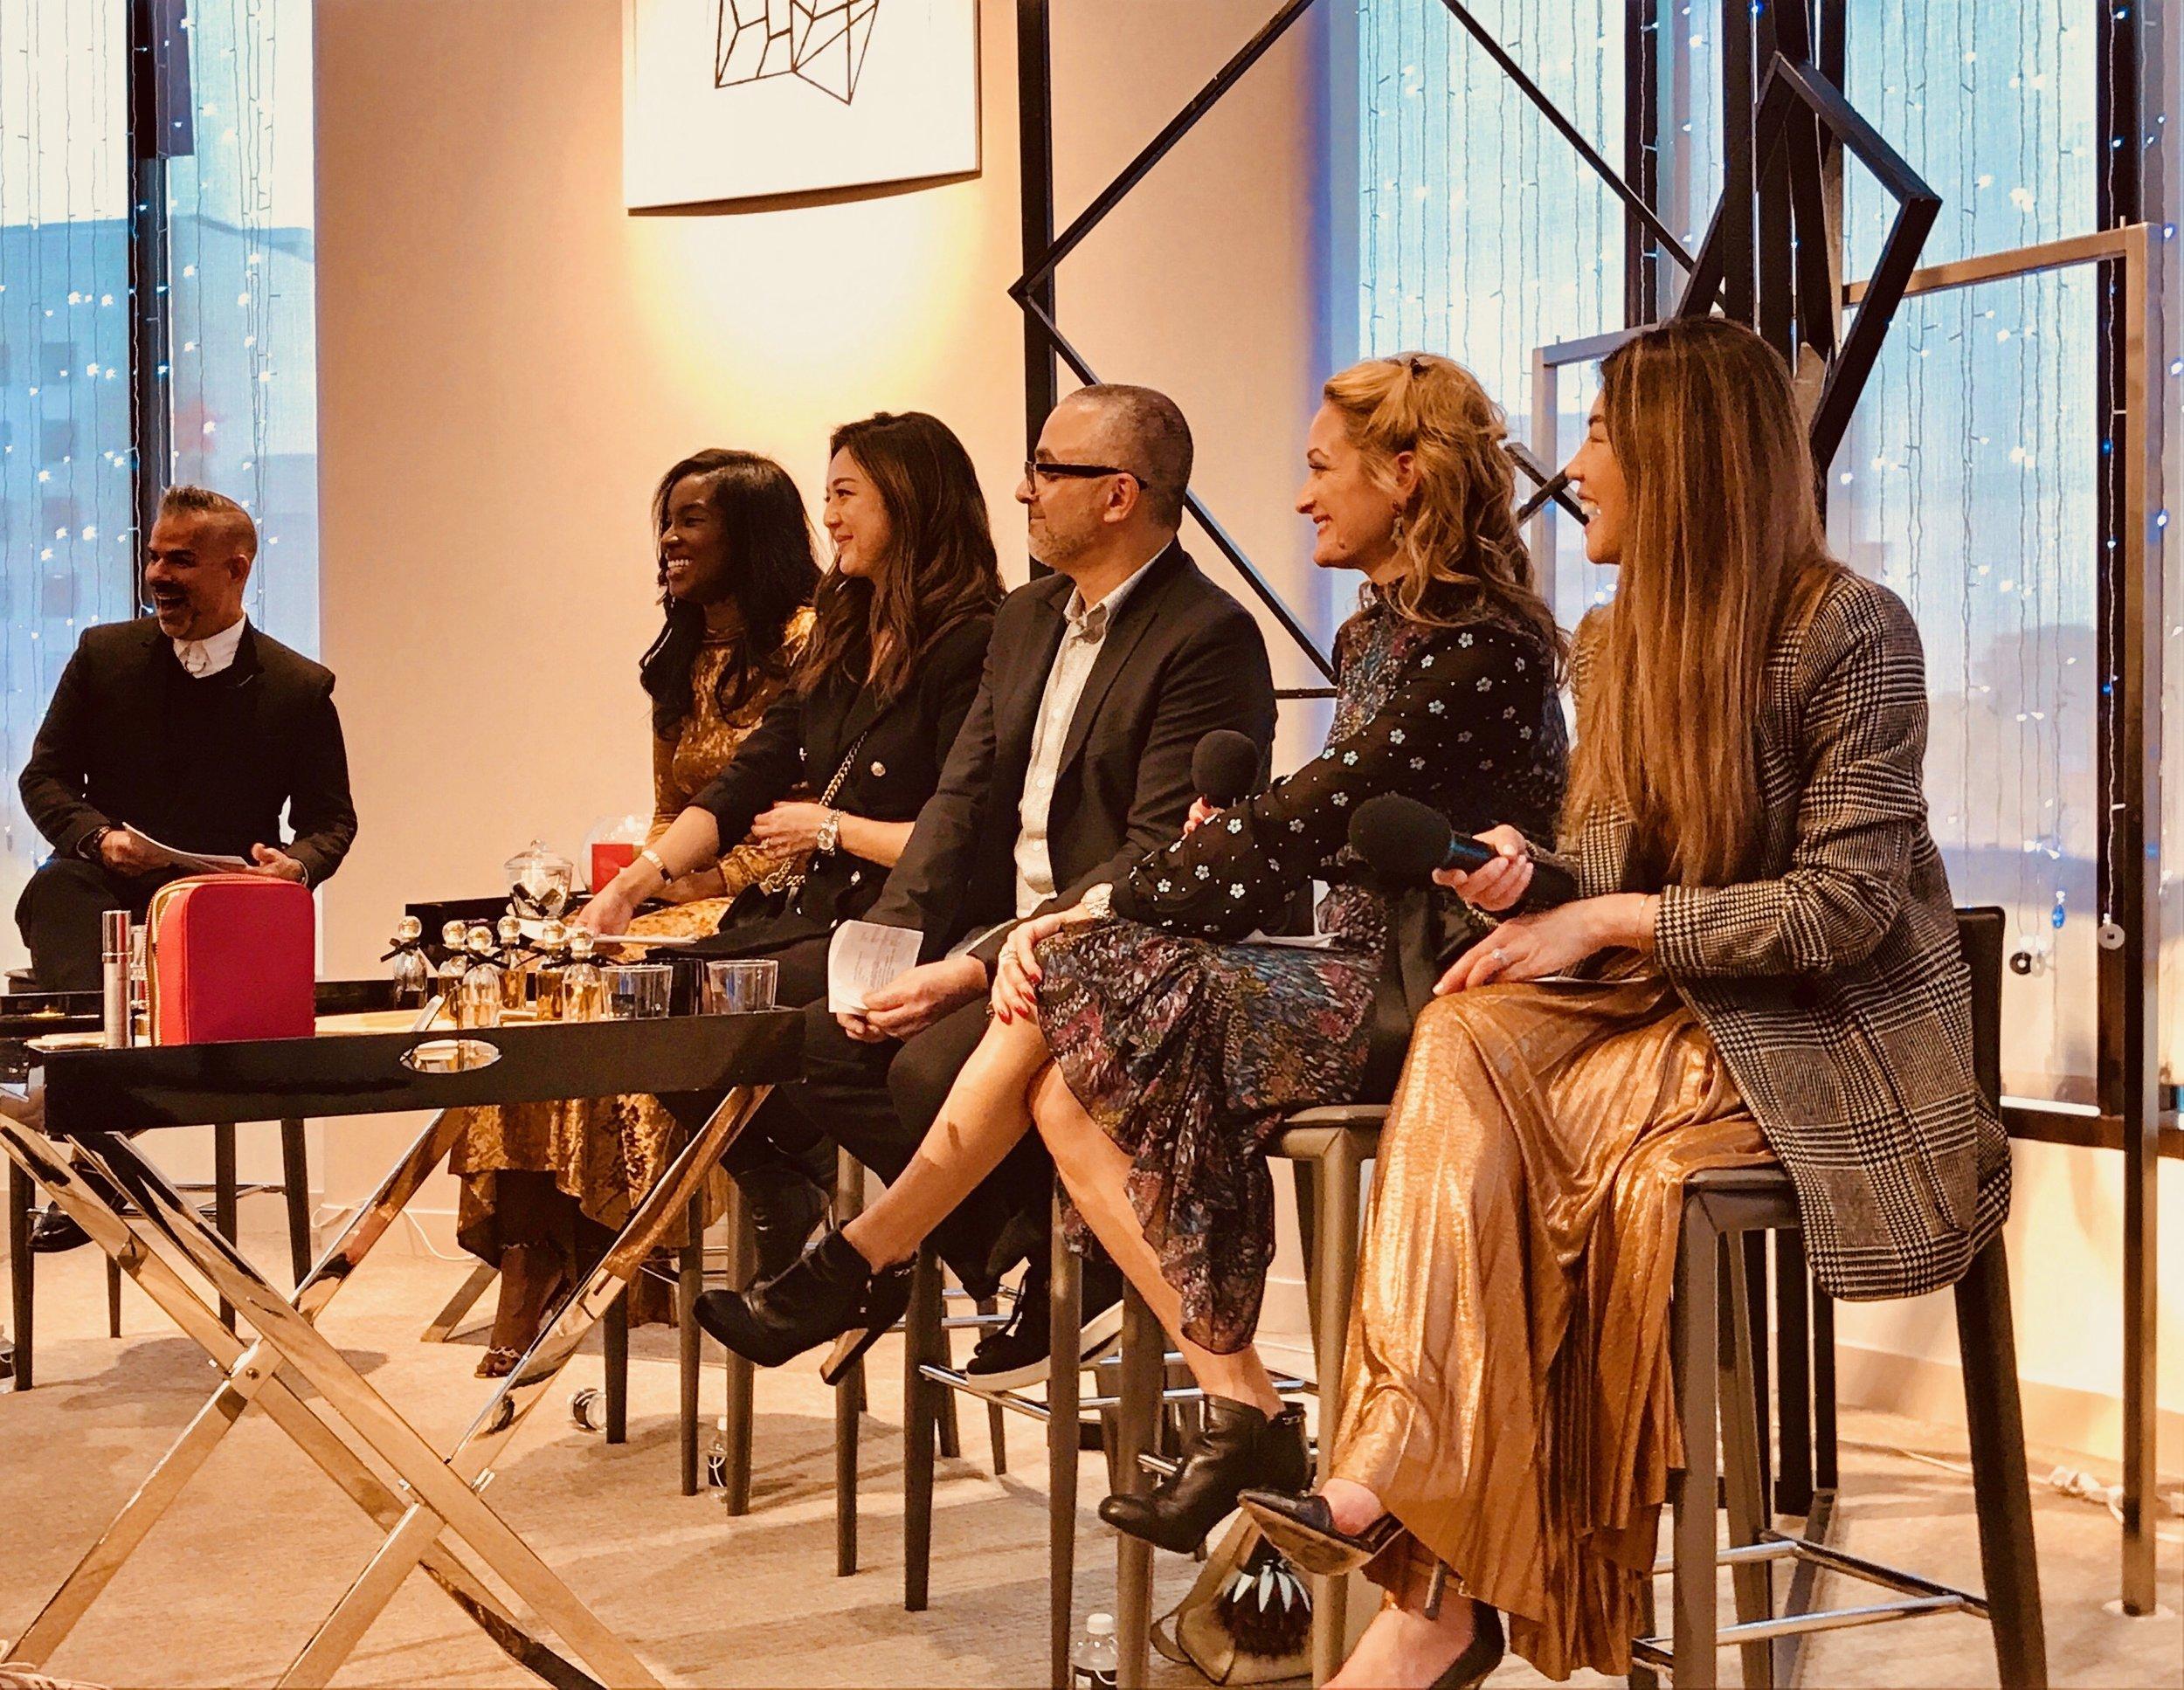 Saks Panel of Influencers